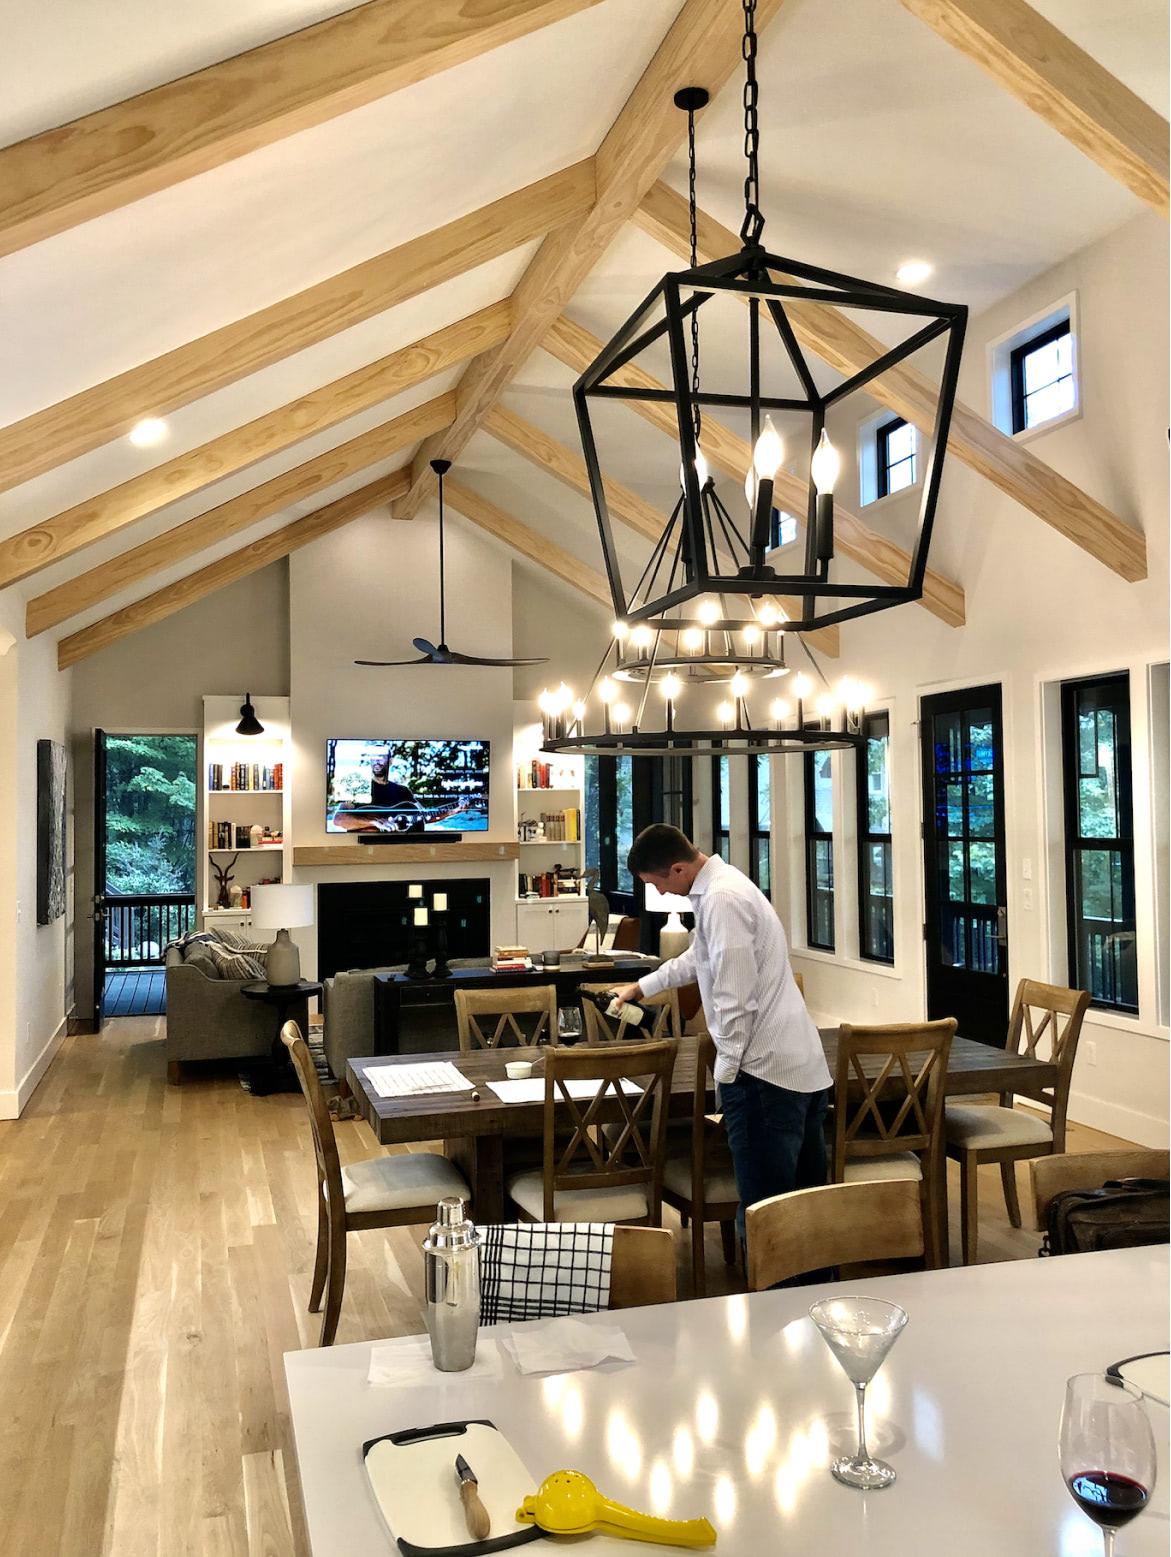 Lake Cove interior kitchen with person pouring wine